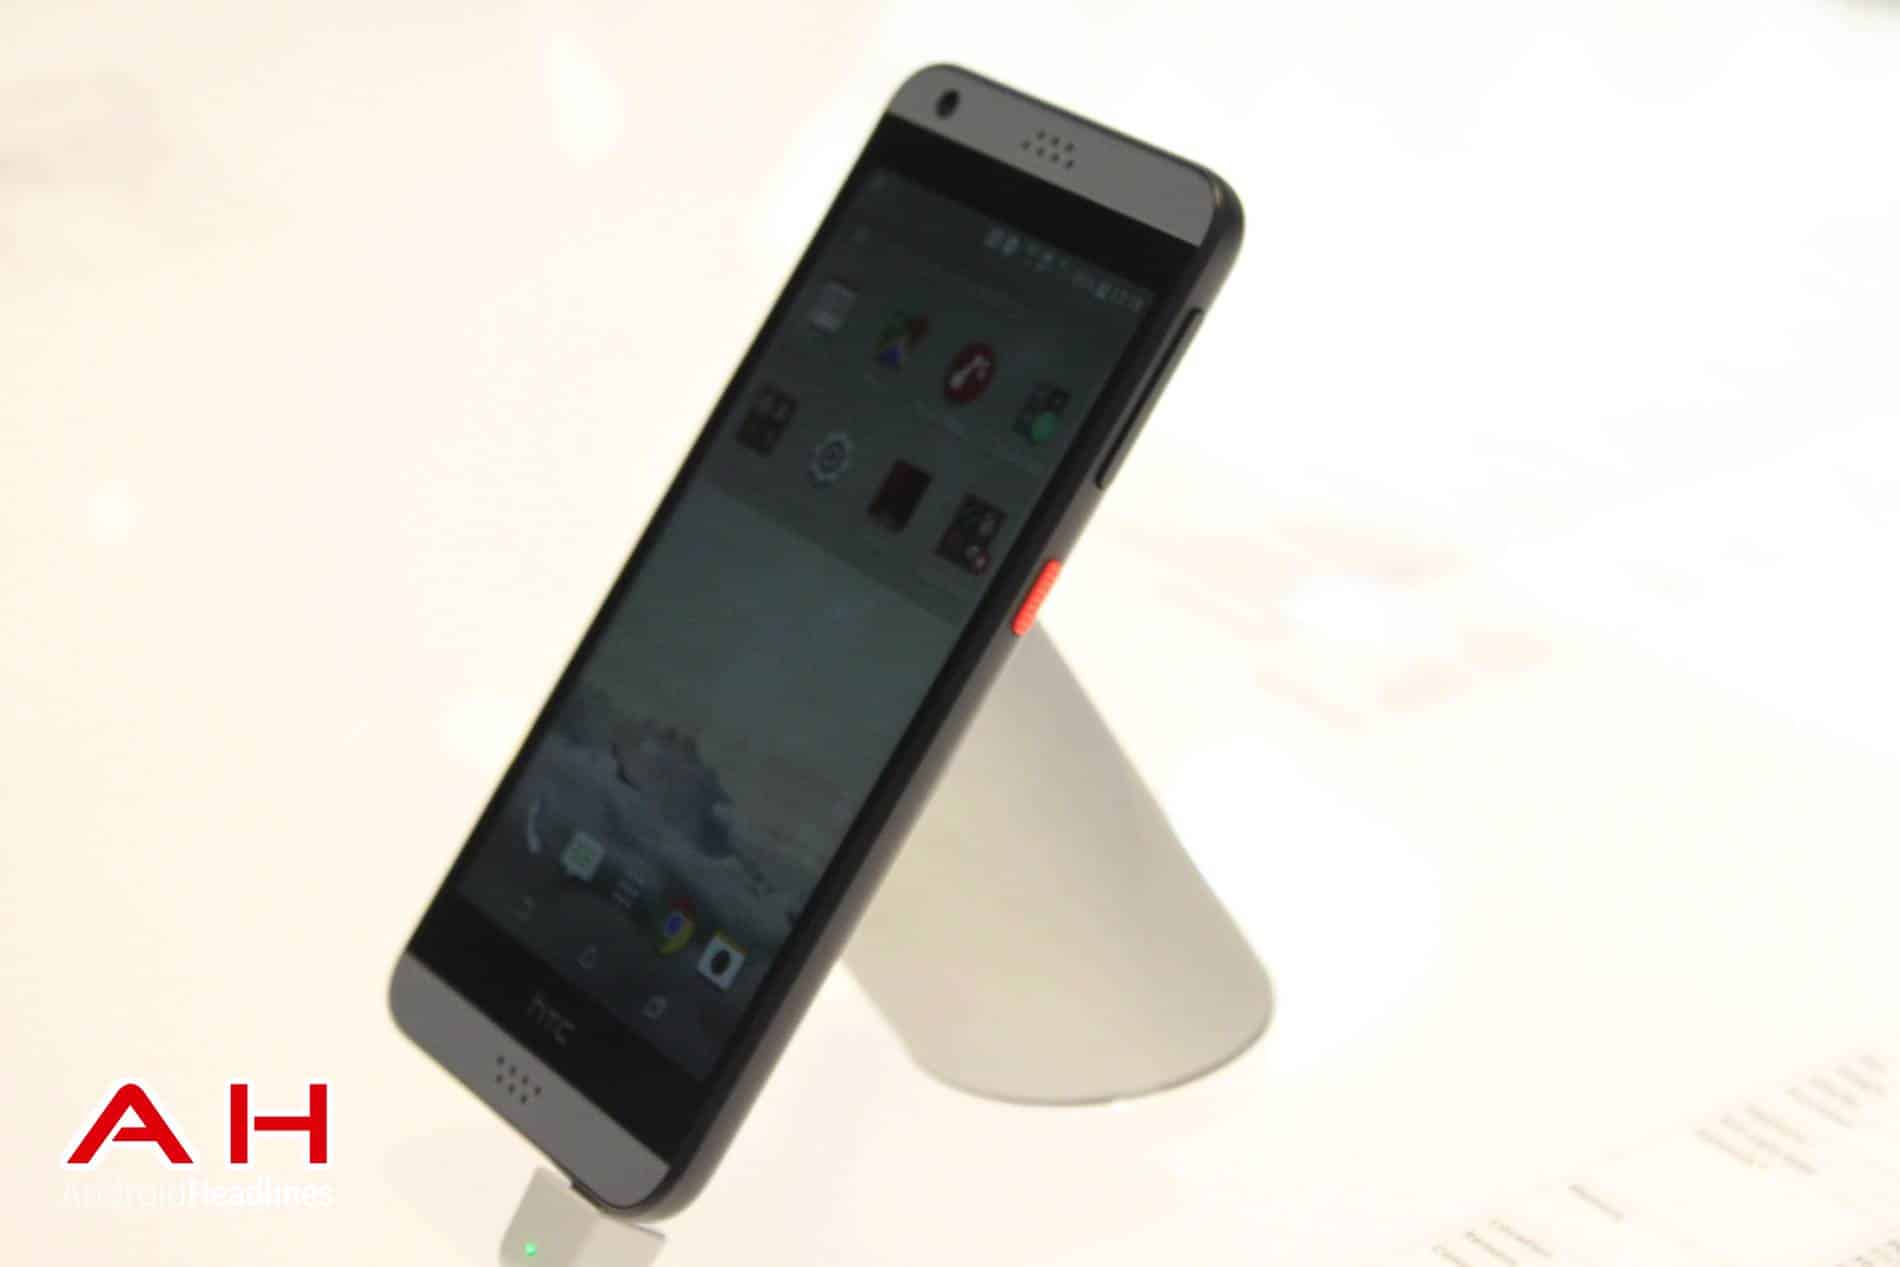 HTC Desire 530 MWC AH 07